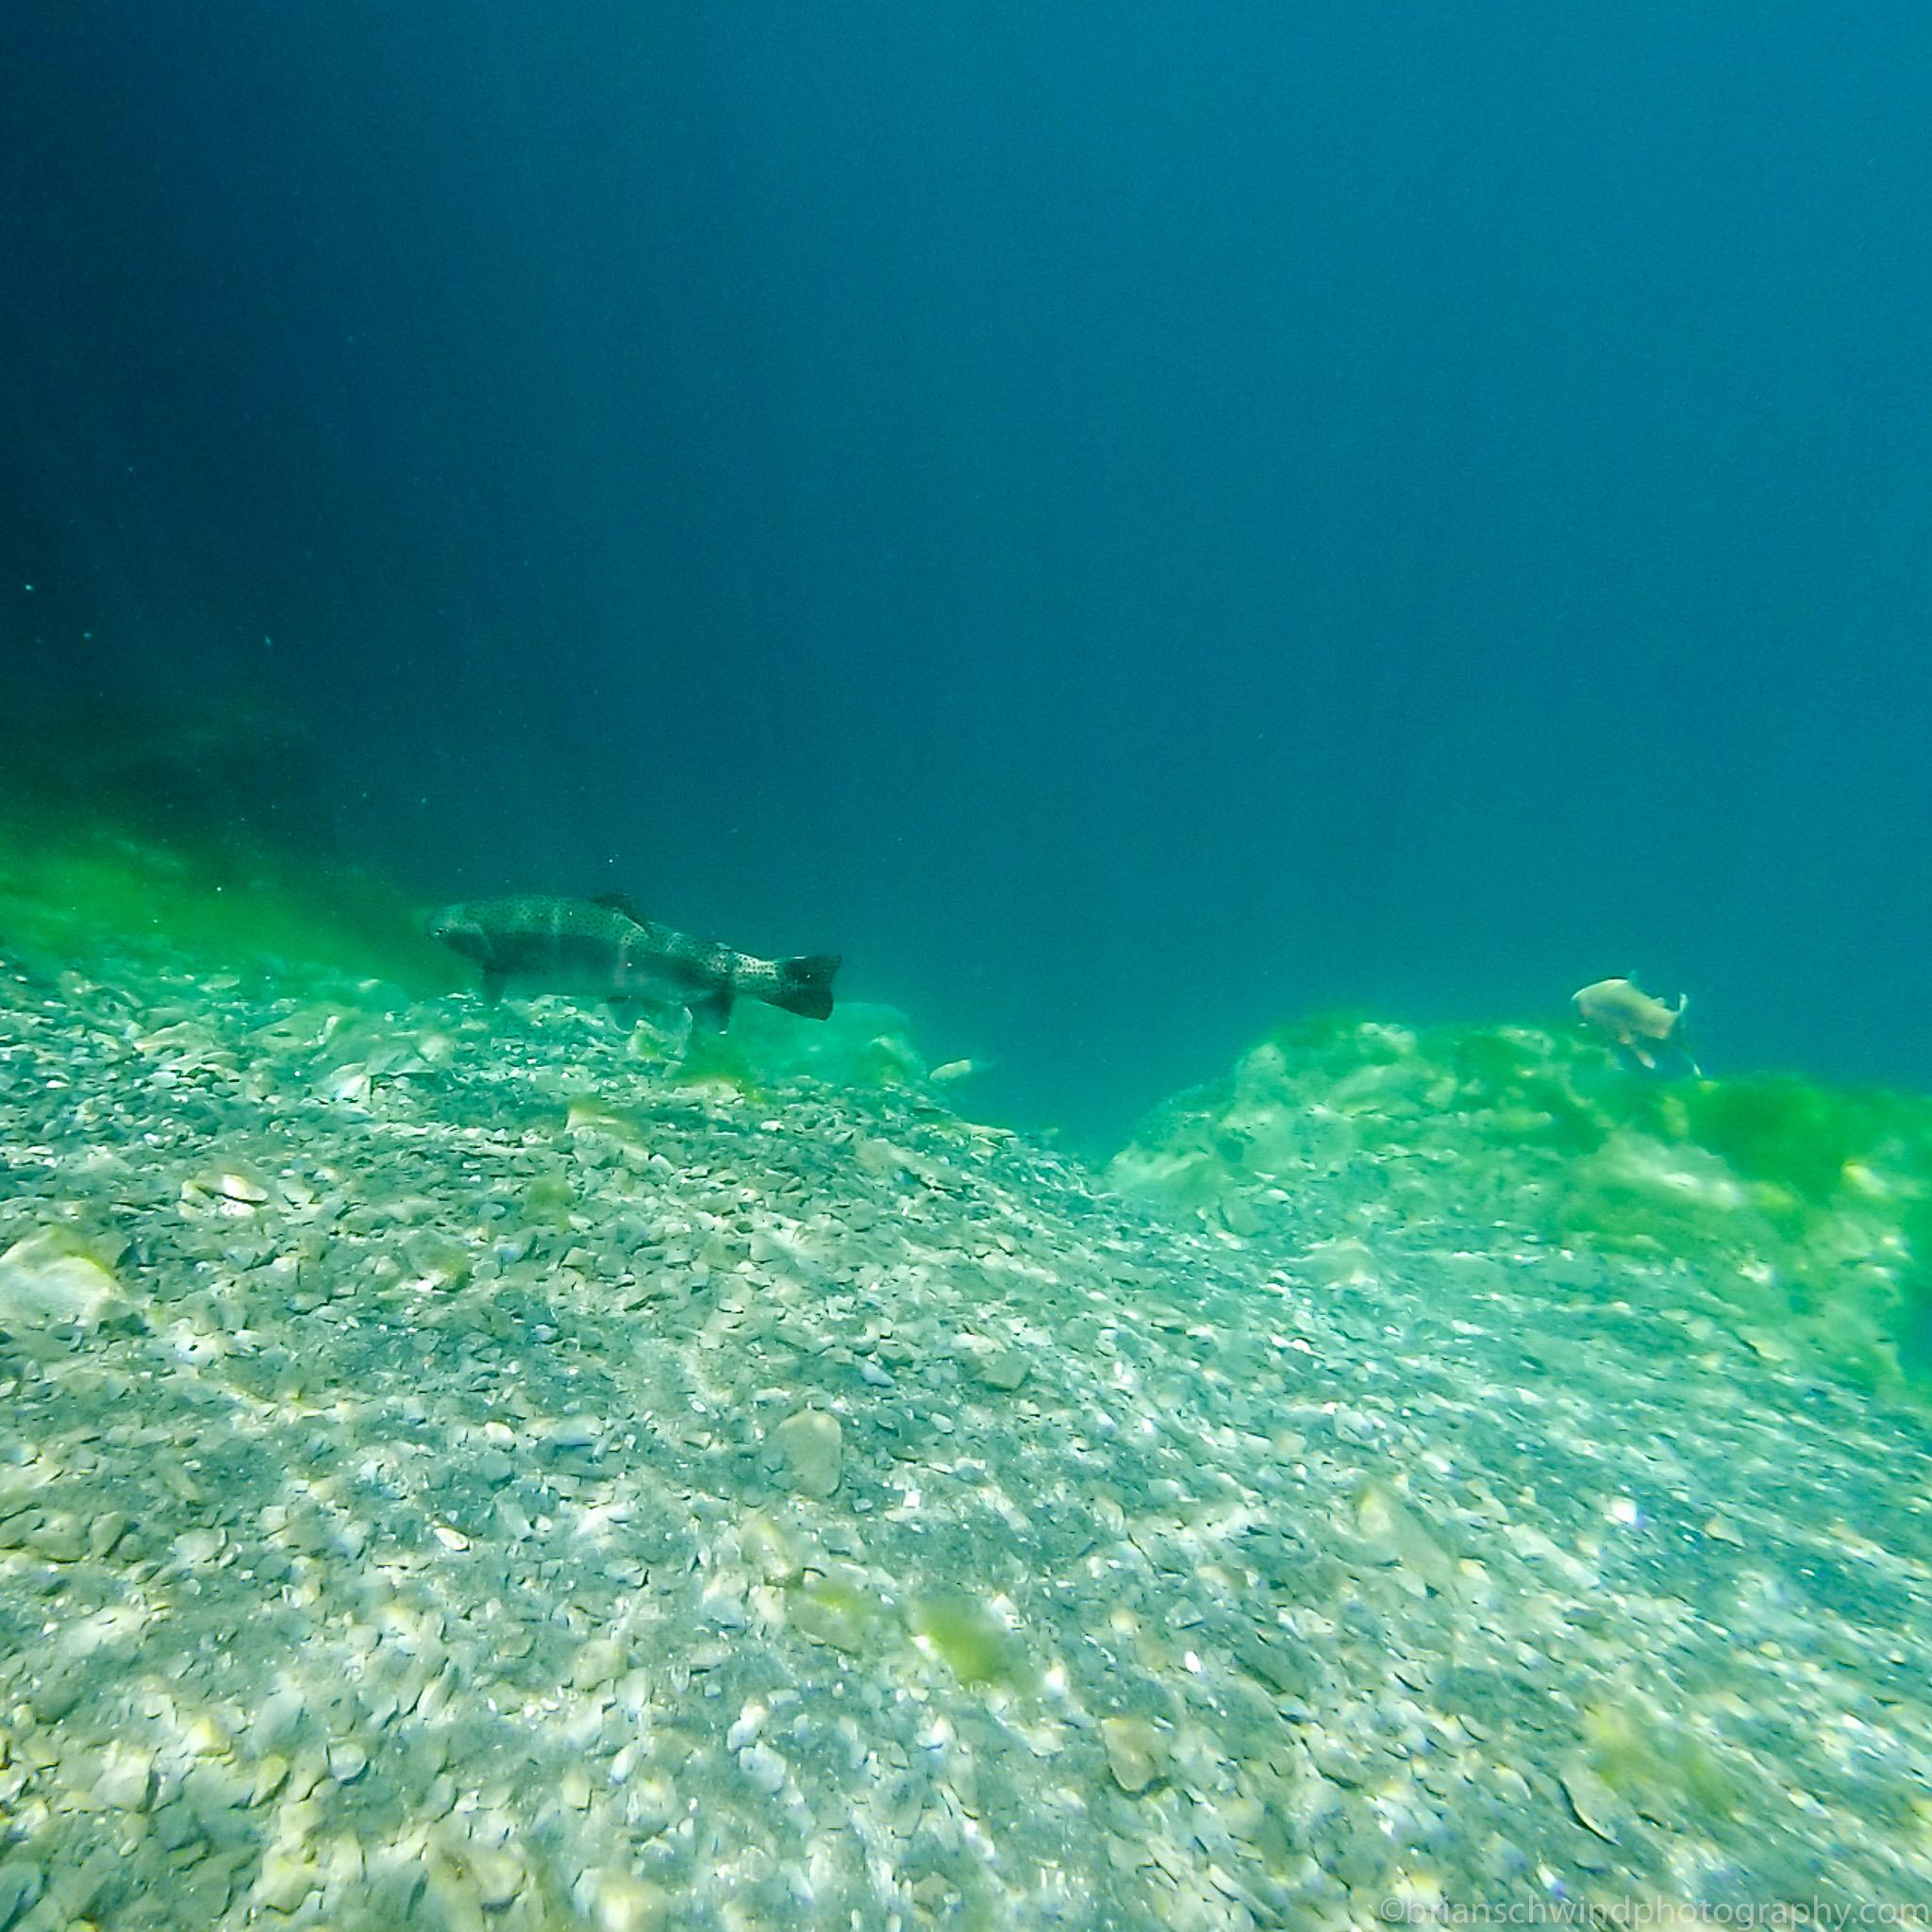 Trout Underwater at DutchSprings 2015